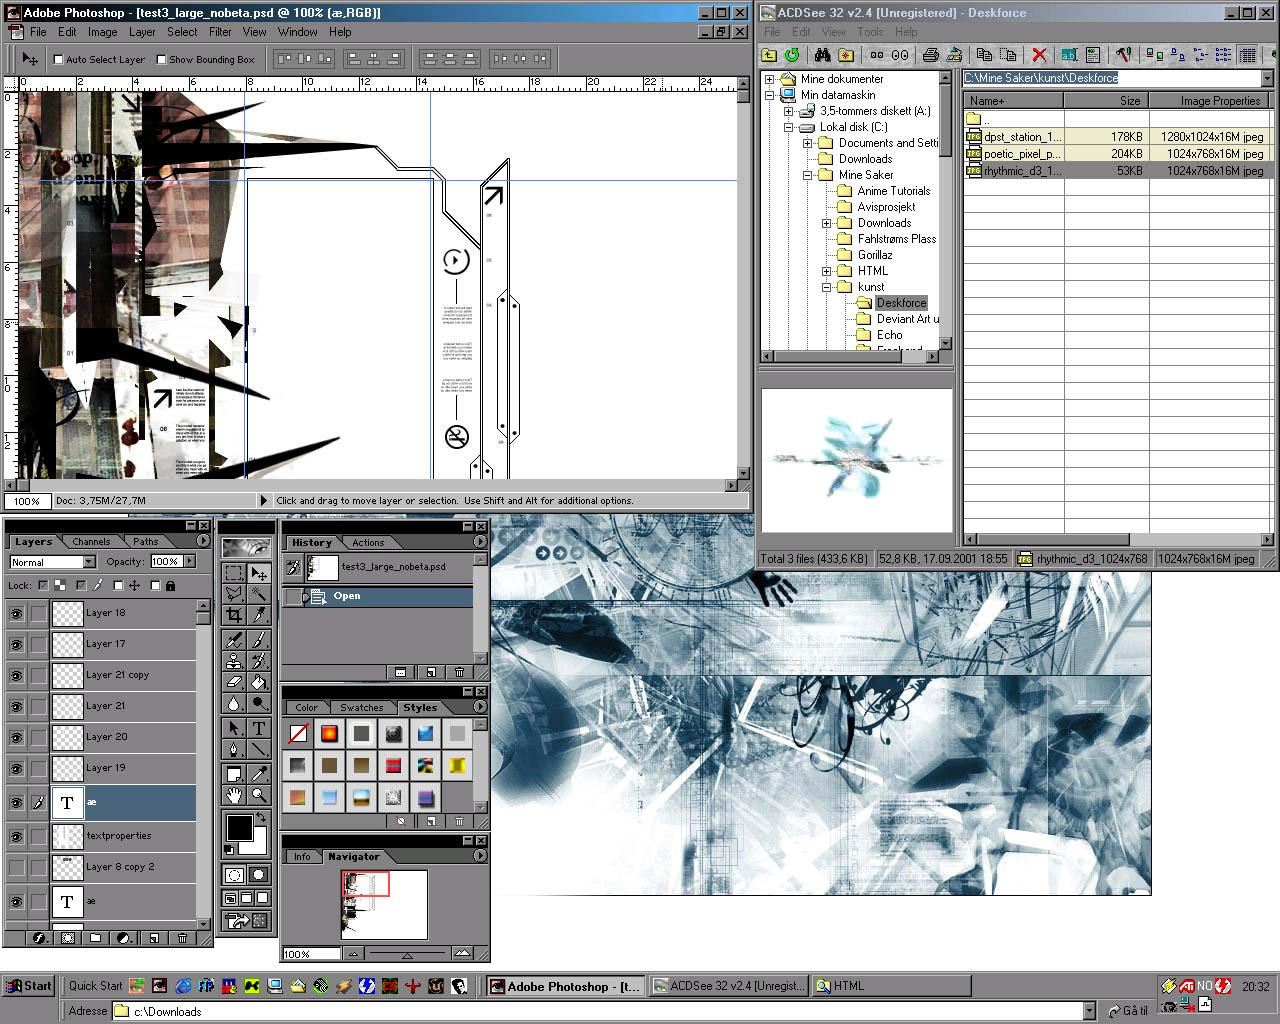 necron desktop - 25 09 01 by necron